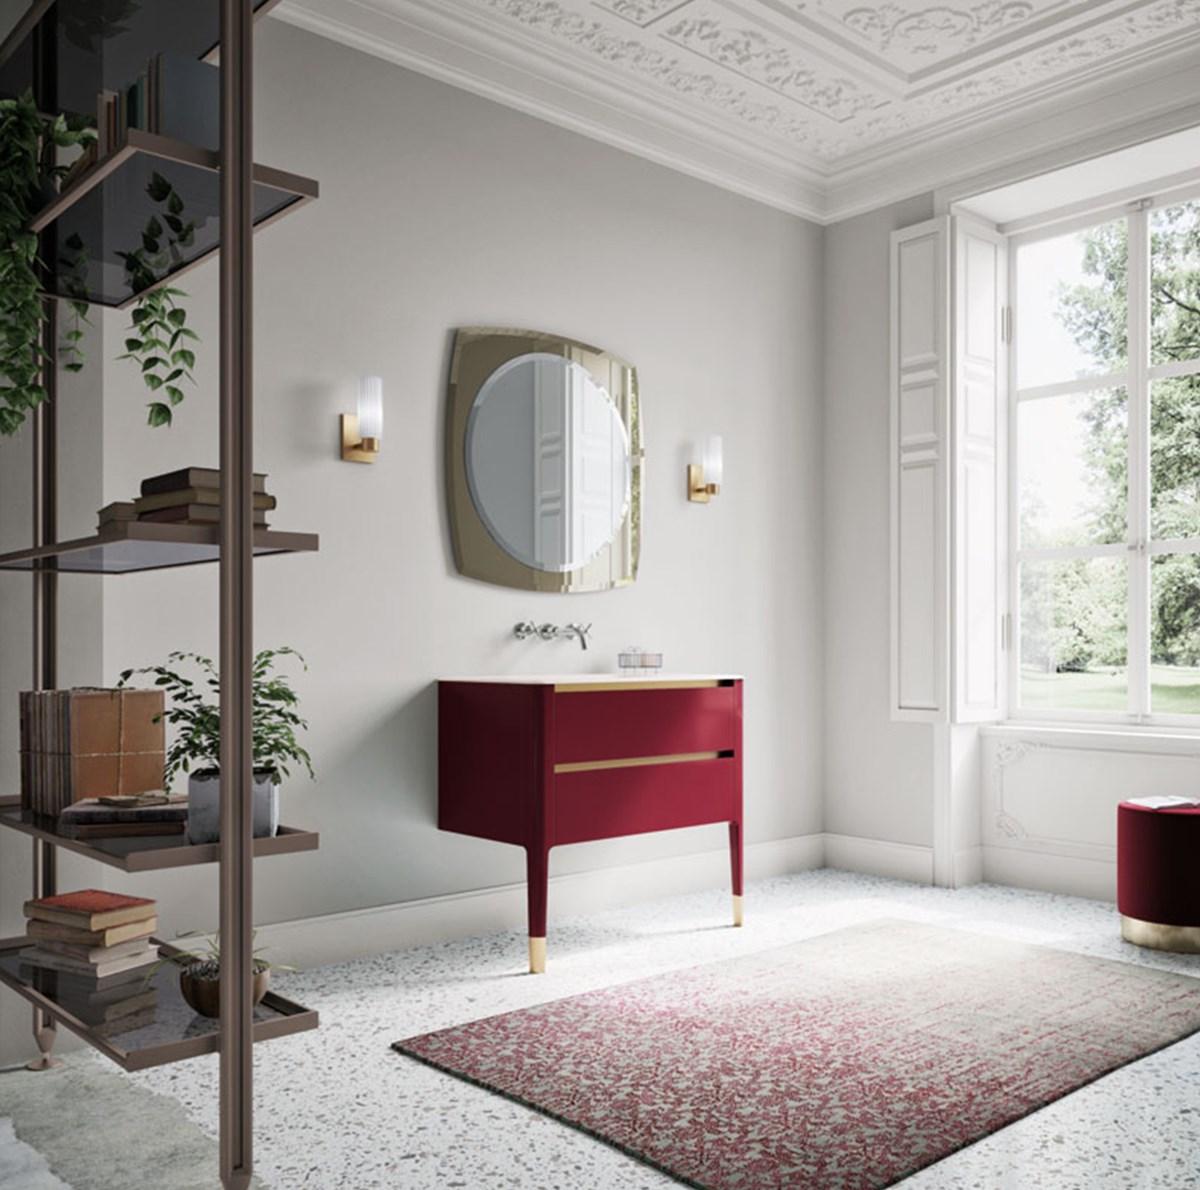 Puntotre Art Bathroom1.1 Matisse Contract